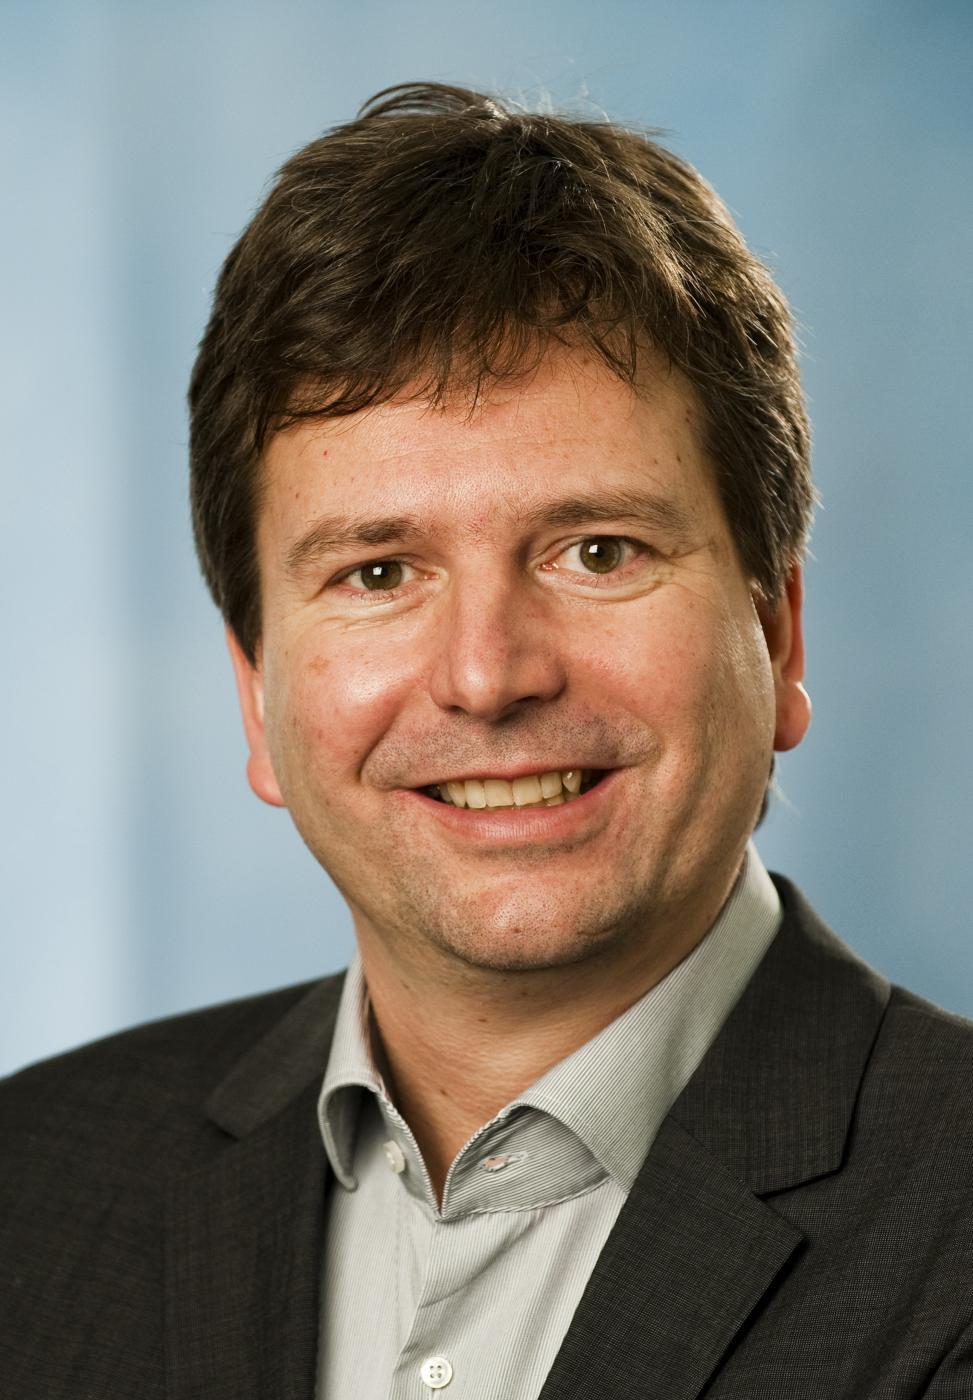 Oliver Bringmann, FZI / University of Tuebingen, DE